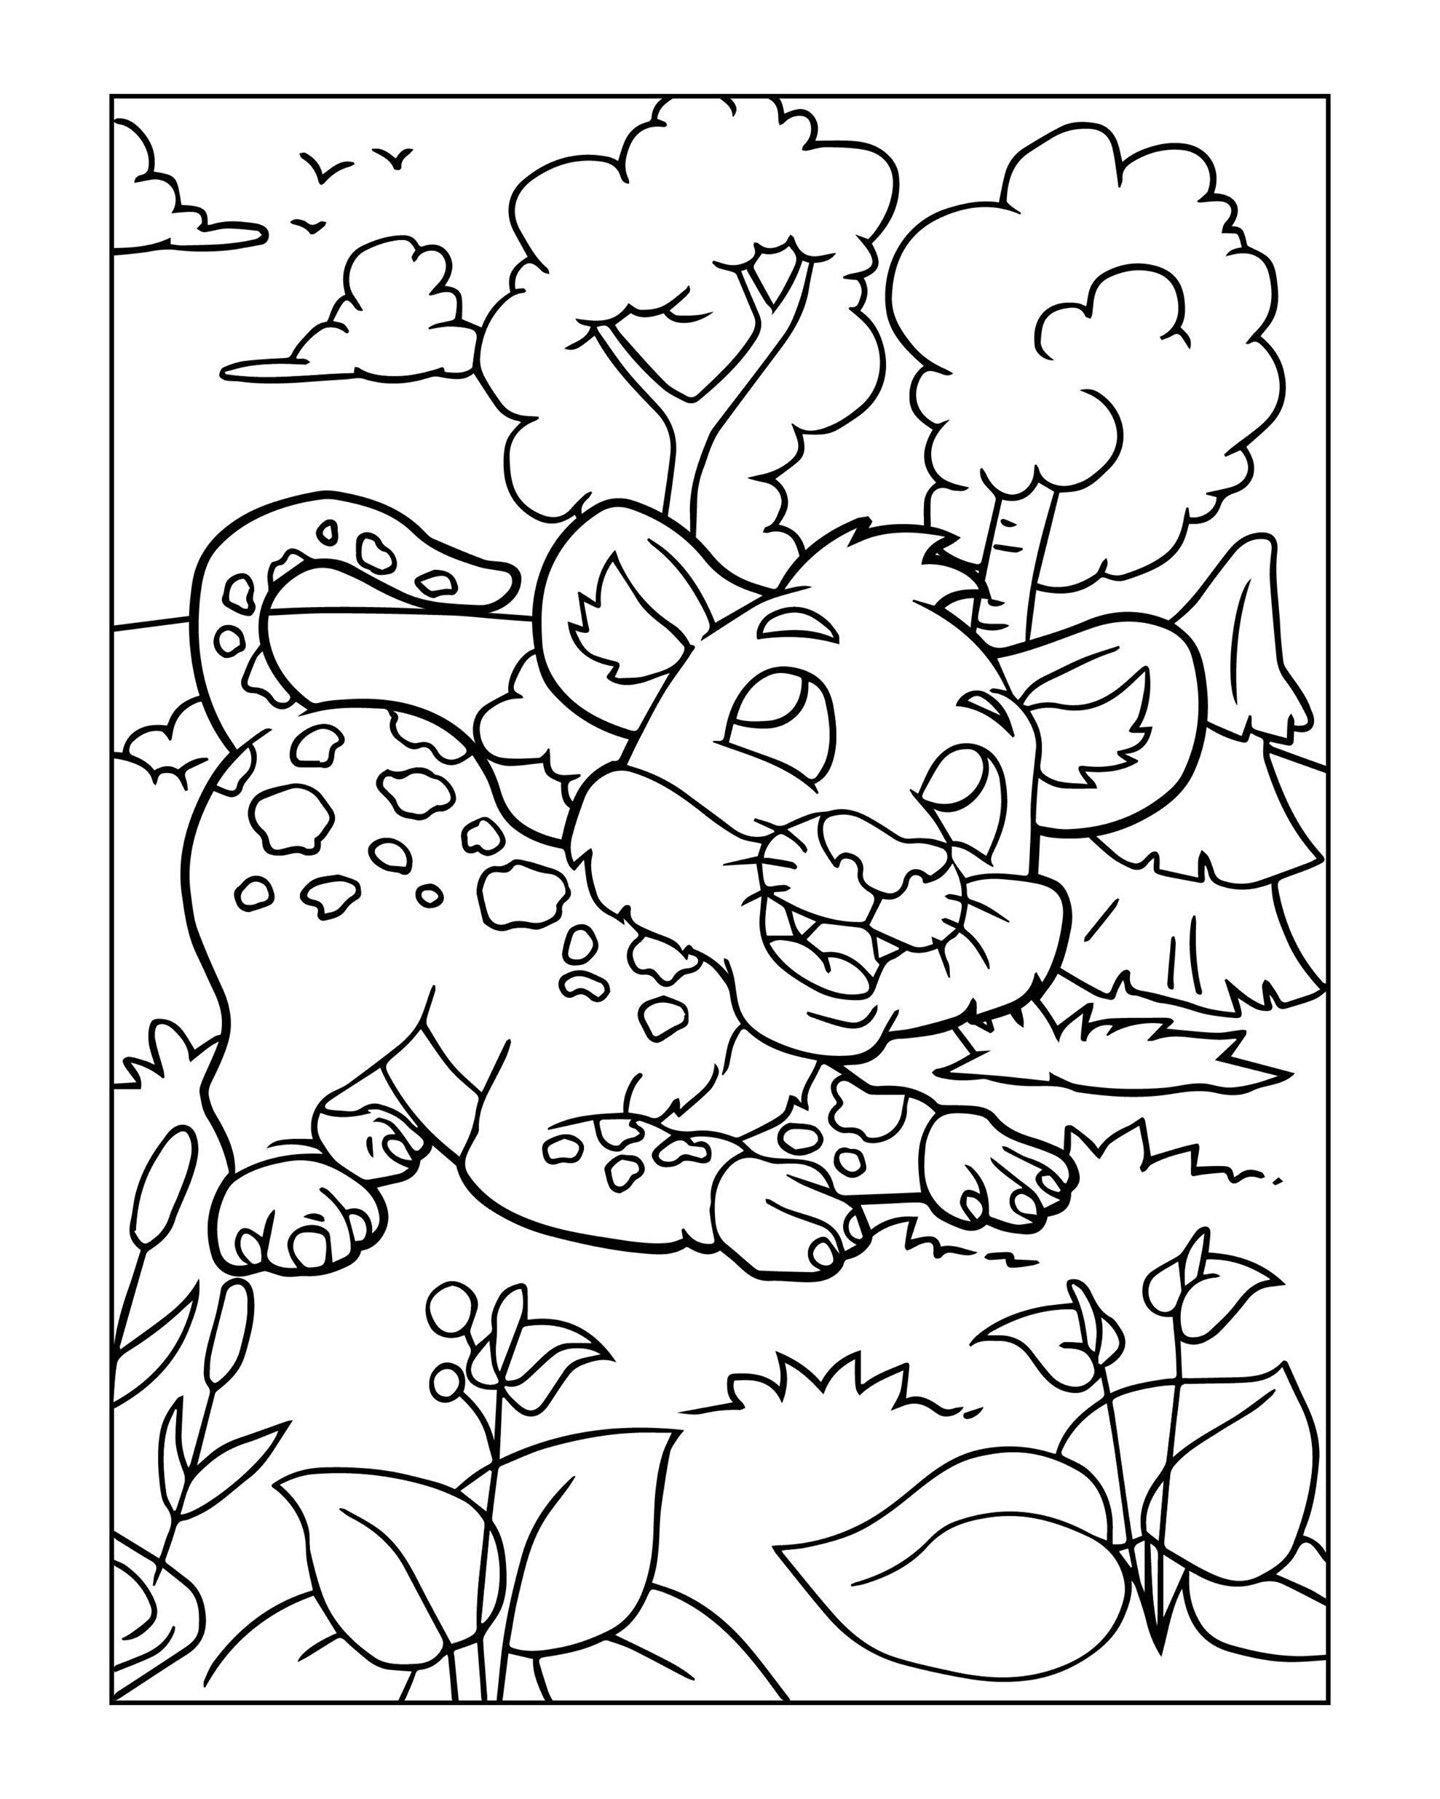 Zoo Animal Coloring Page 15 Zoo Animal Coloring Pages Animal Coloring Pages Coloring Pages